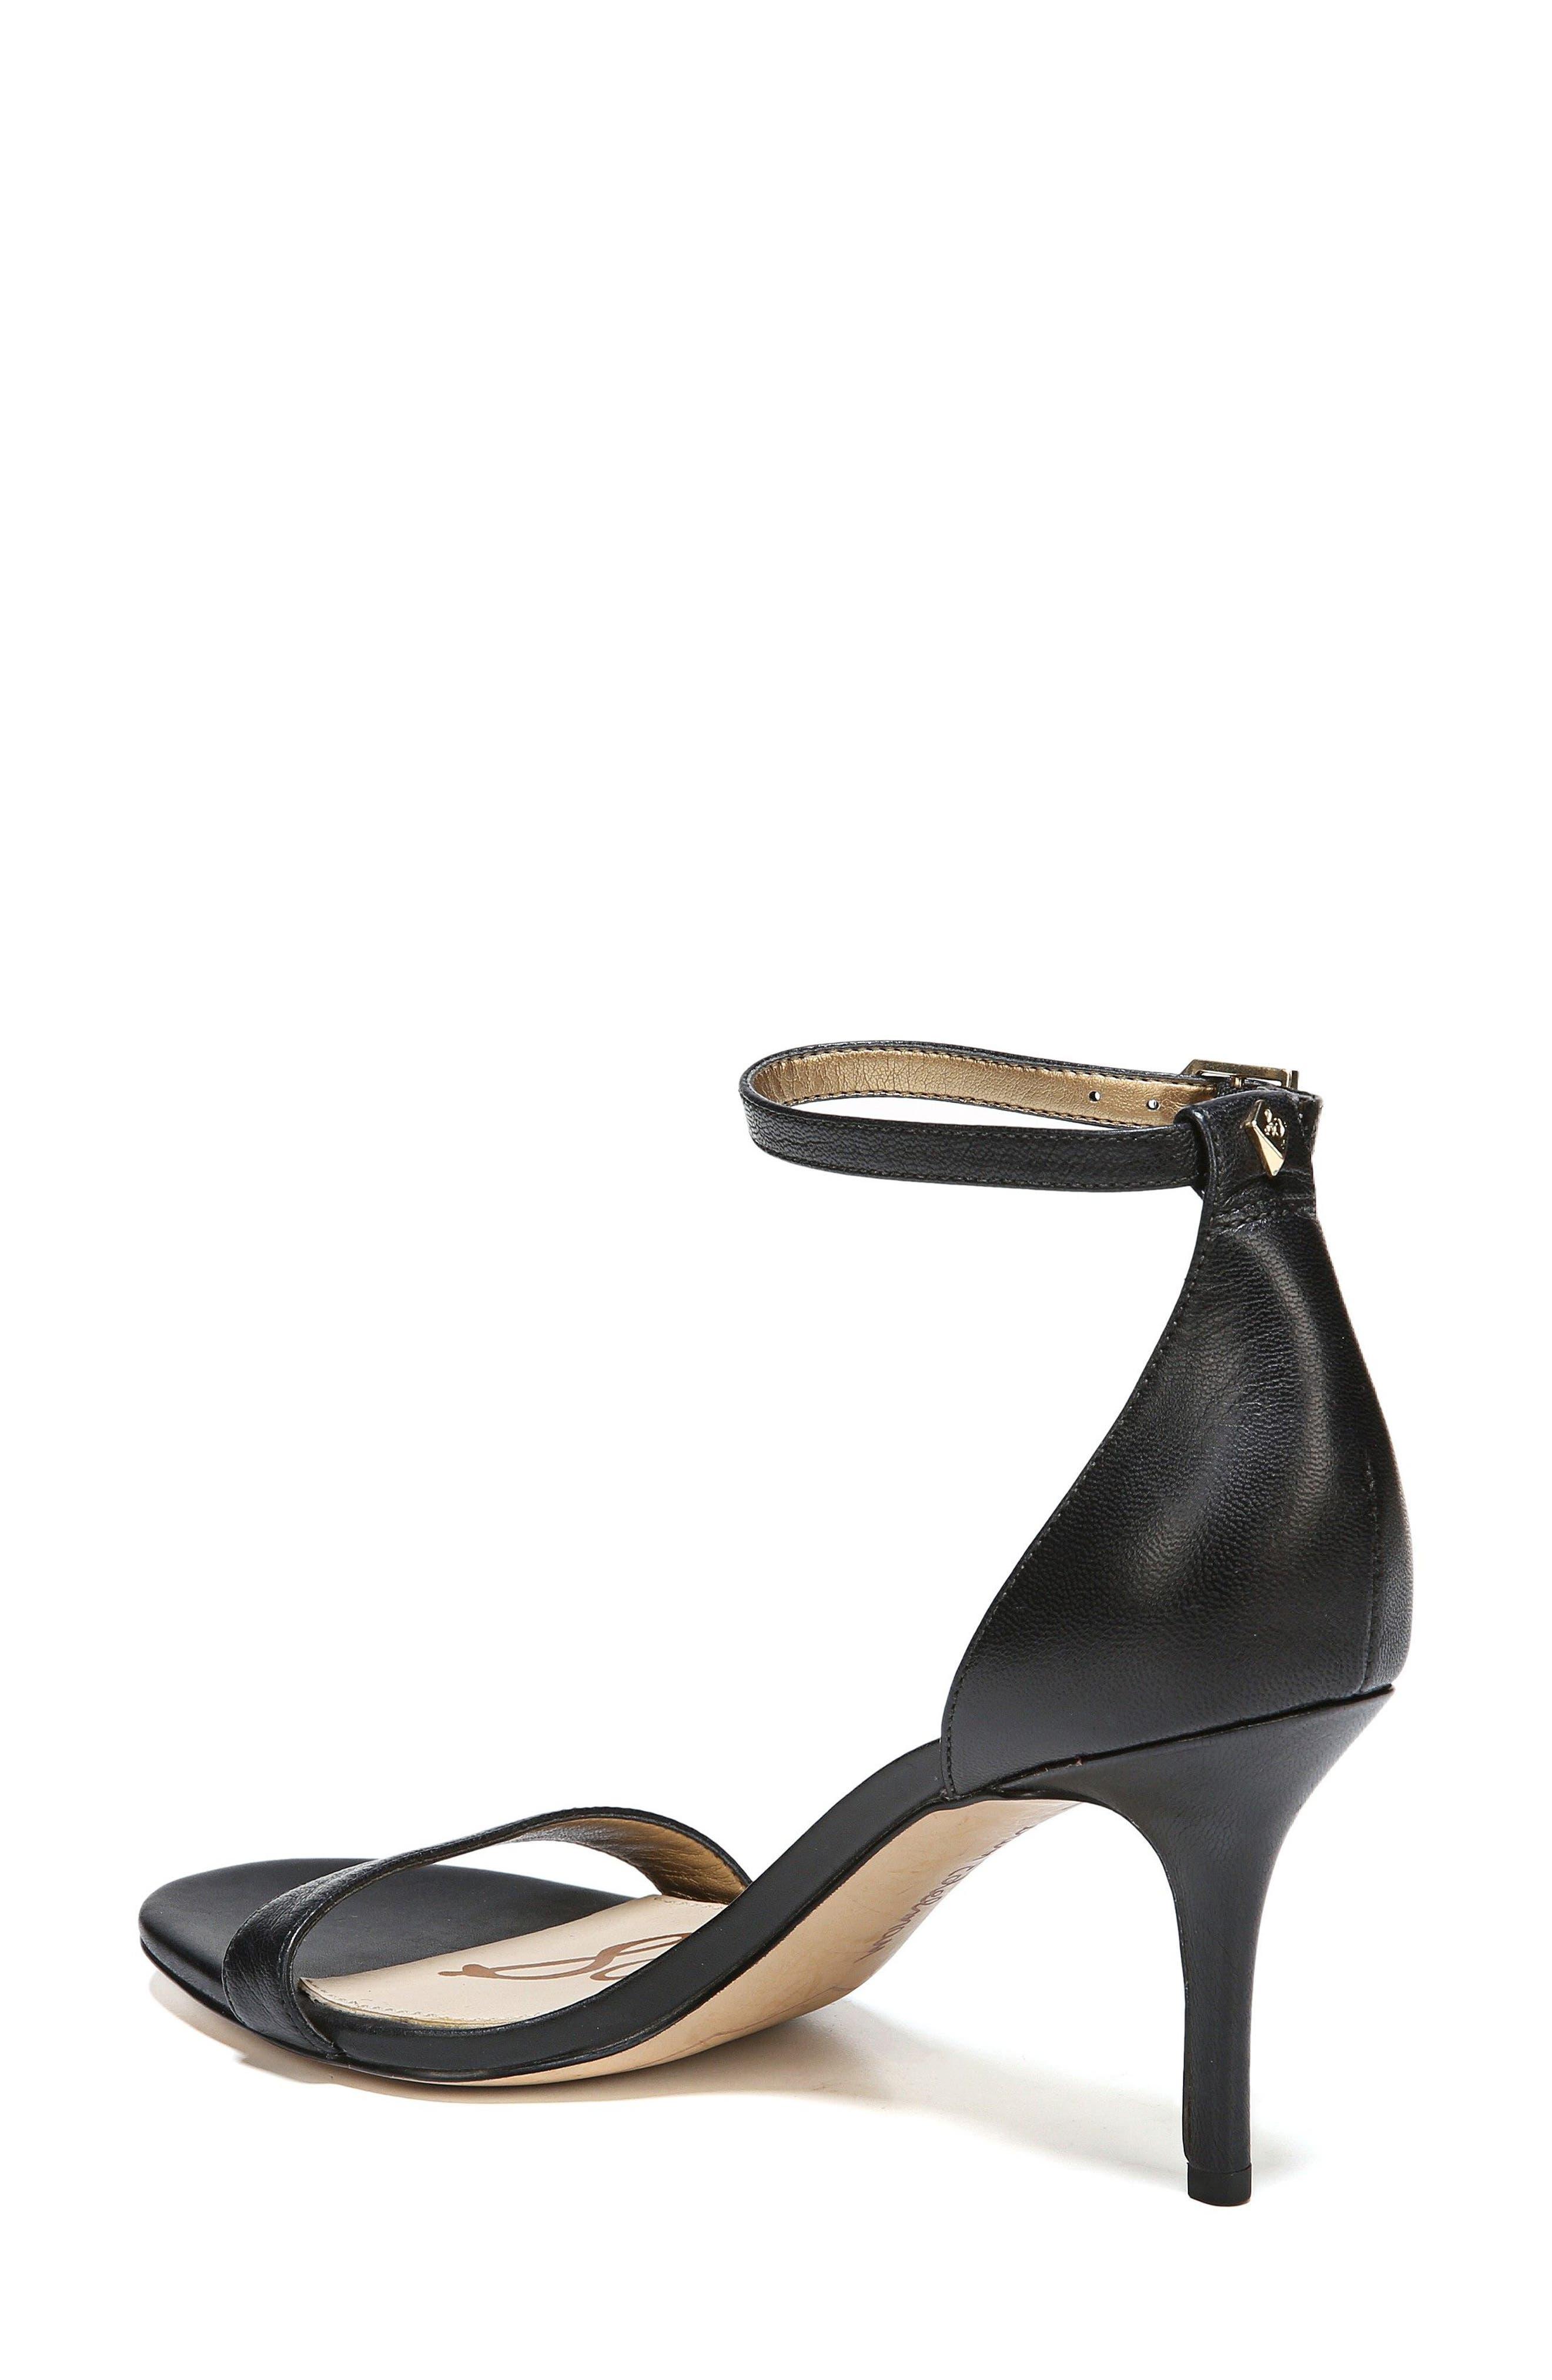 ,                             'Patti' Ankle Strap Sandal,                             Alternate thumbnail 145, color,                             004